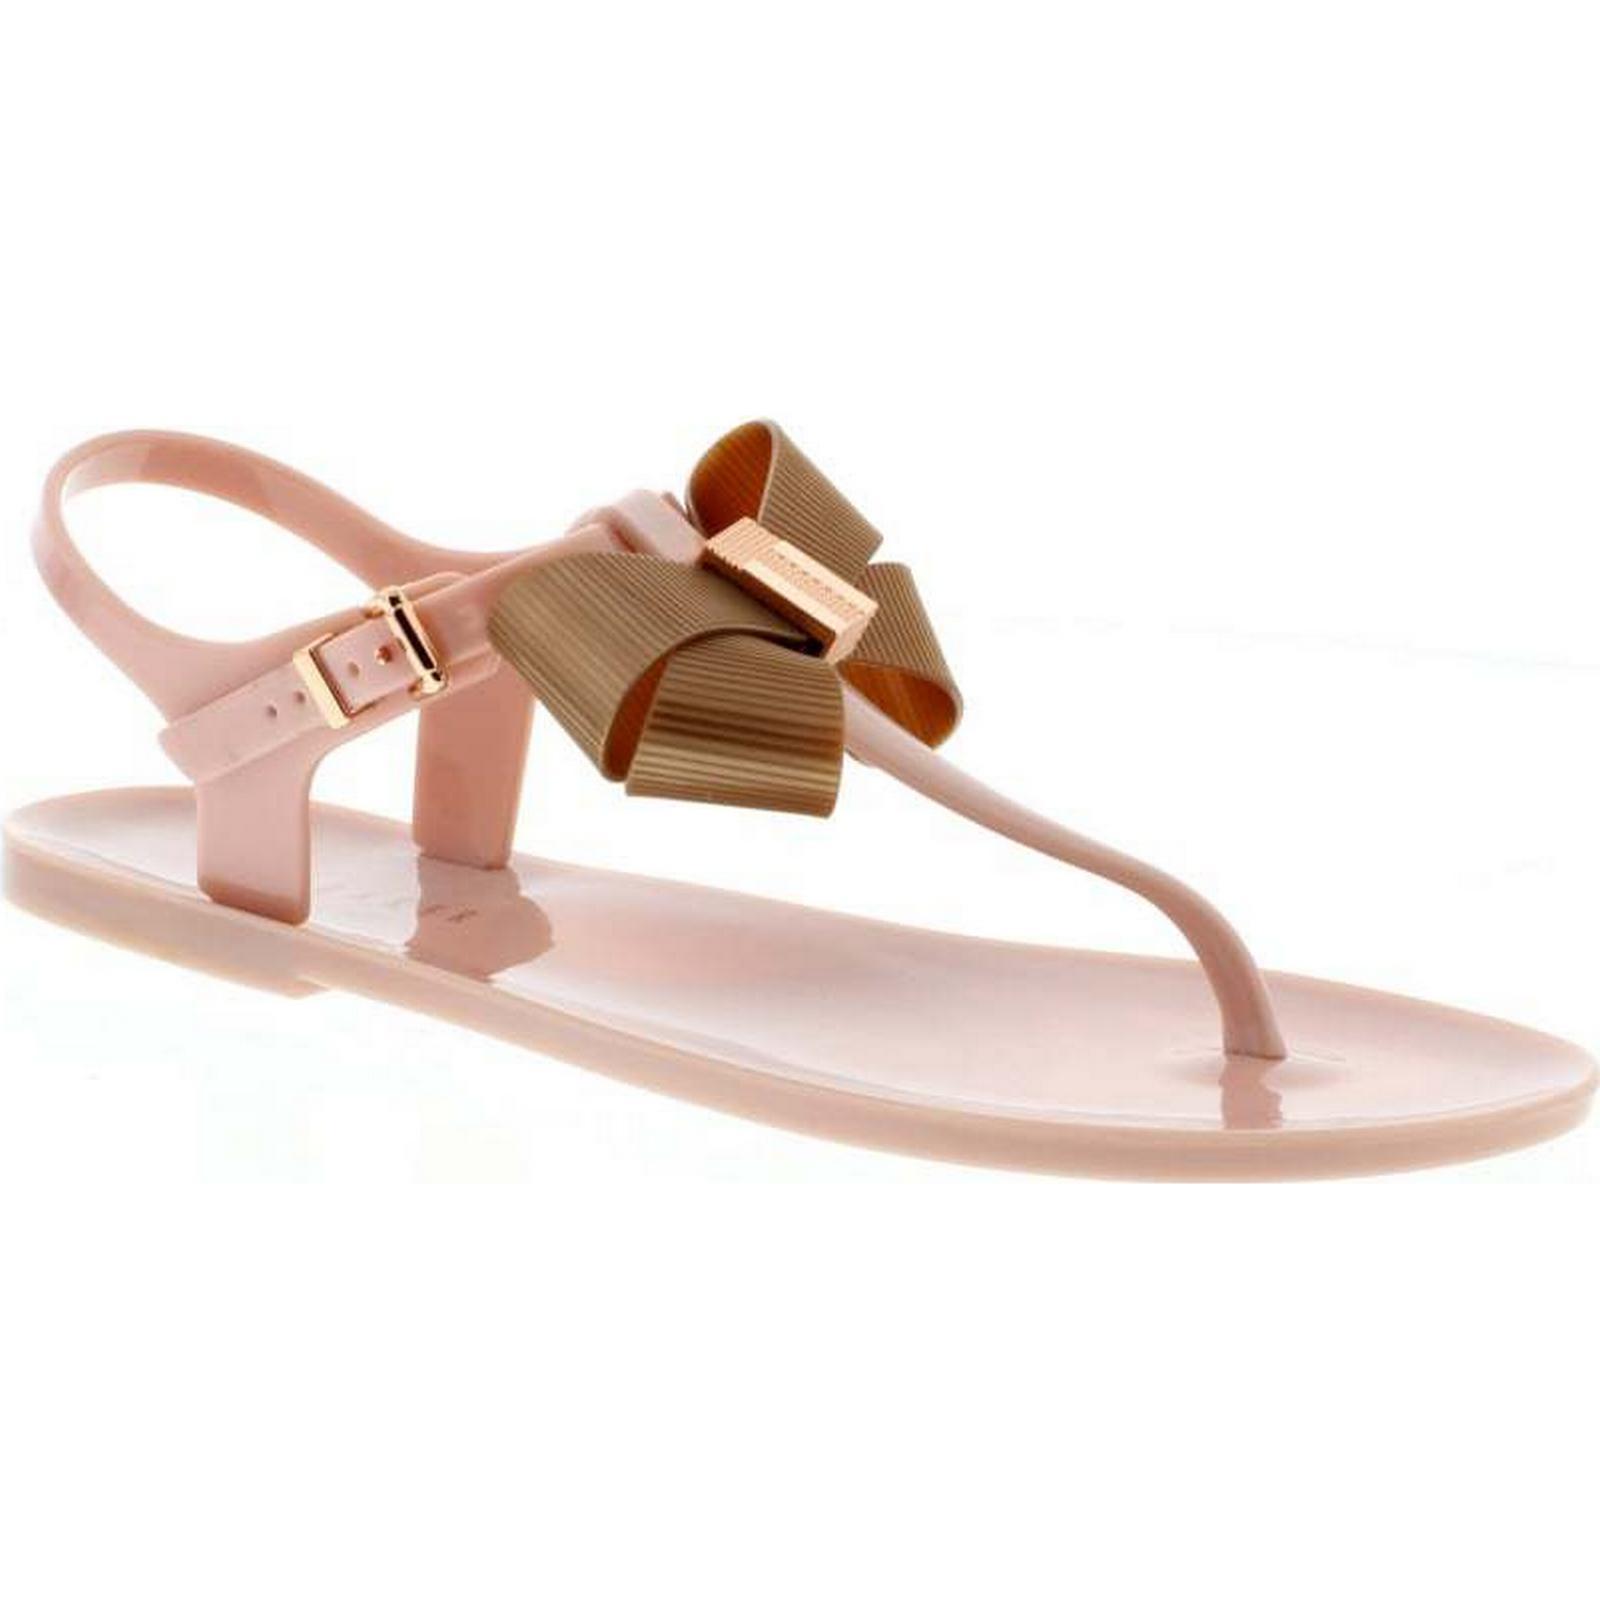 Ted Baker Camaril - TPU Mink Pink TPU - Size: 7 UK d6635b